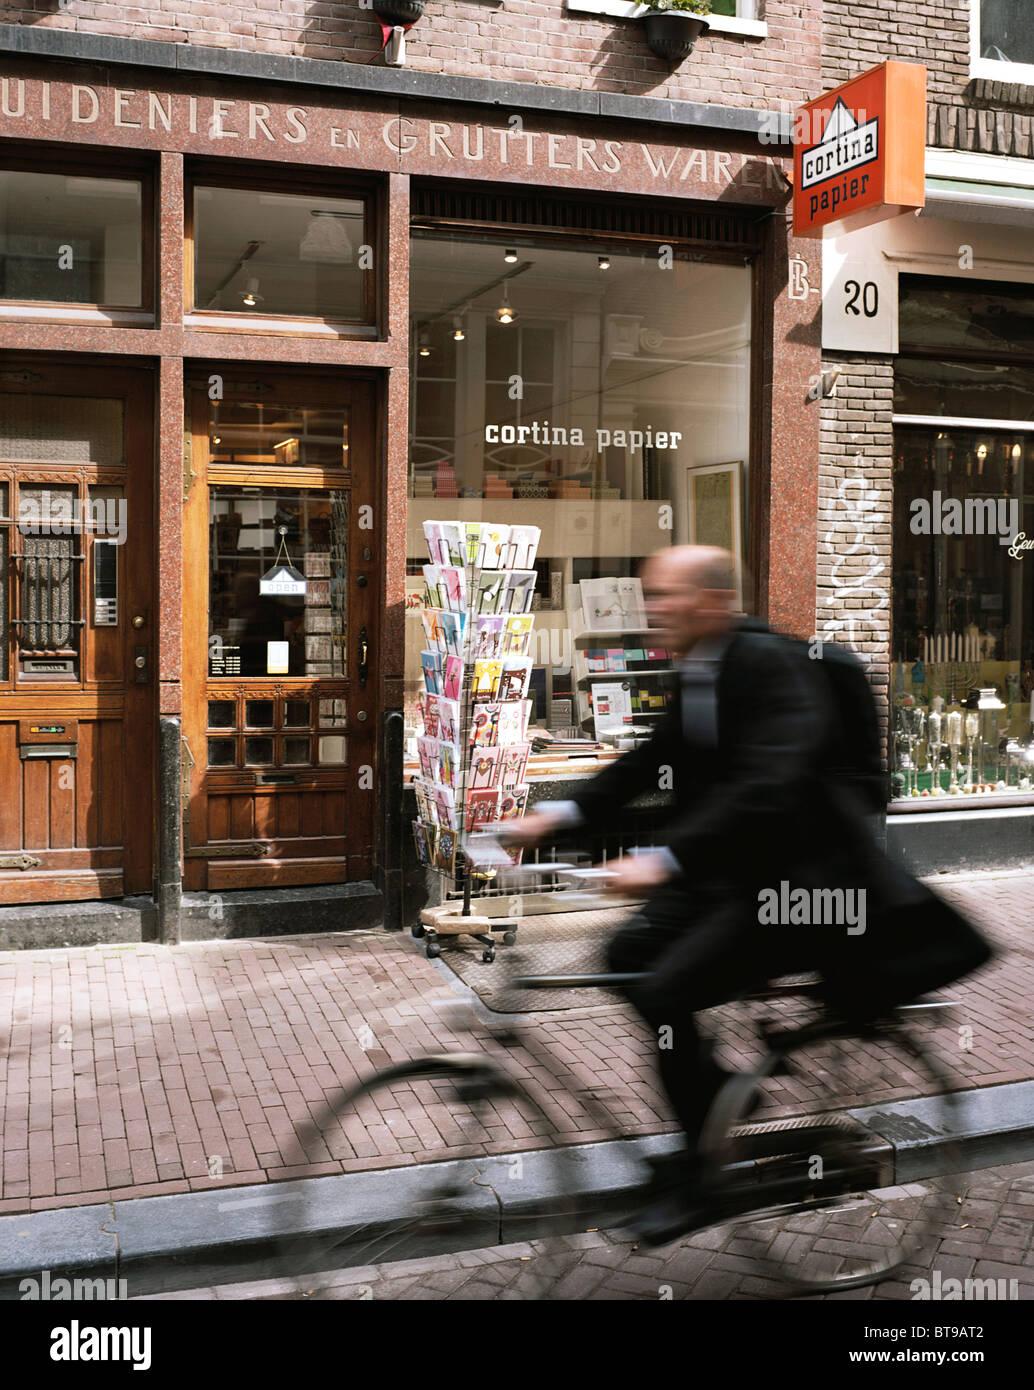 De Negen Straatjes in Amsterdam, wo ein Radfahrer Cortina Papier geht Stockbild